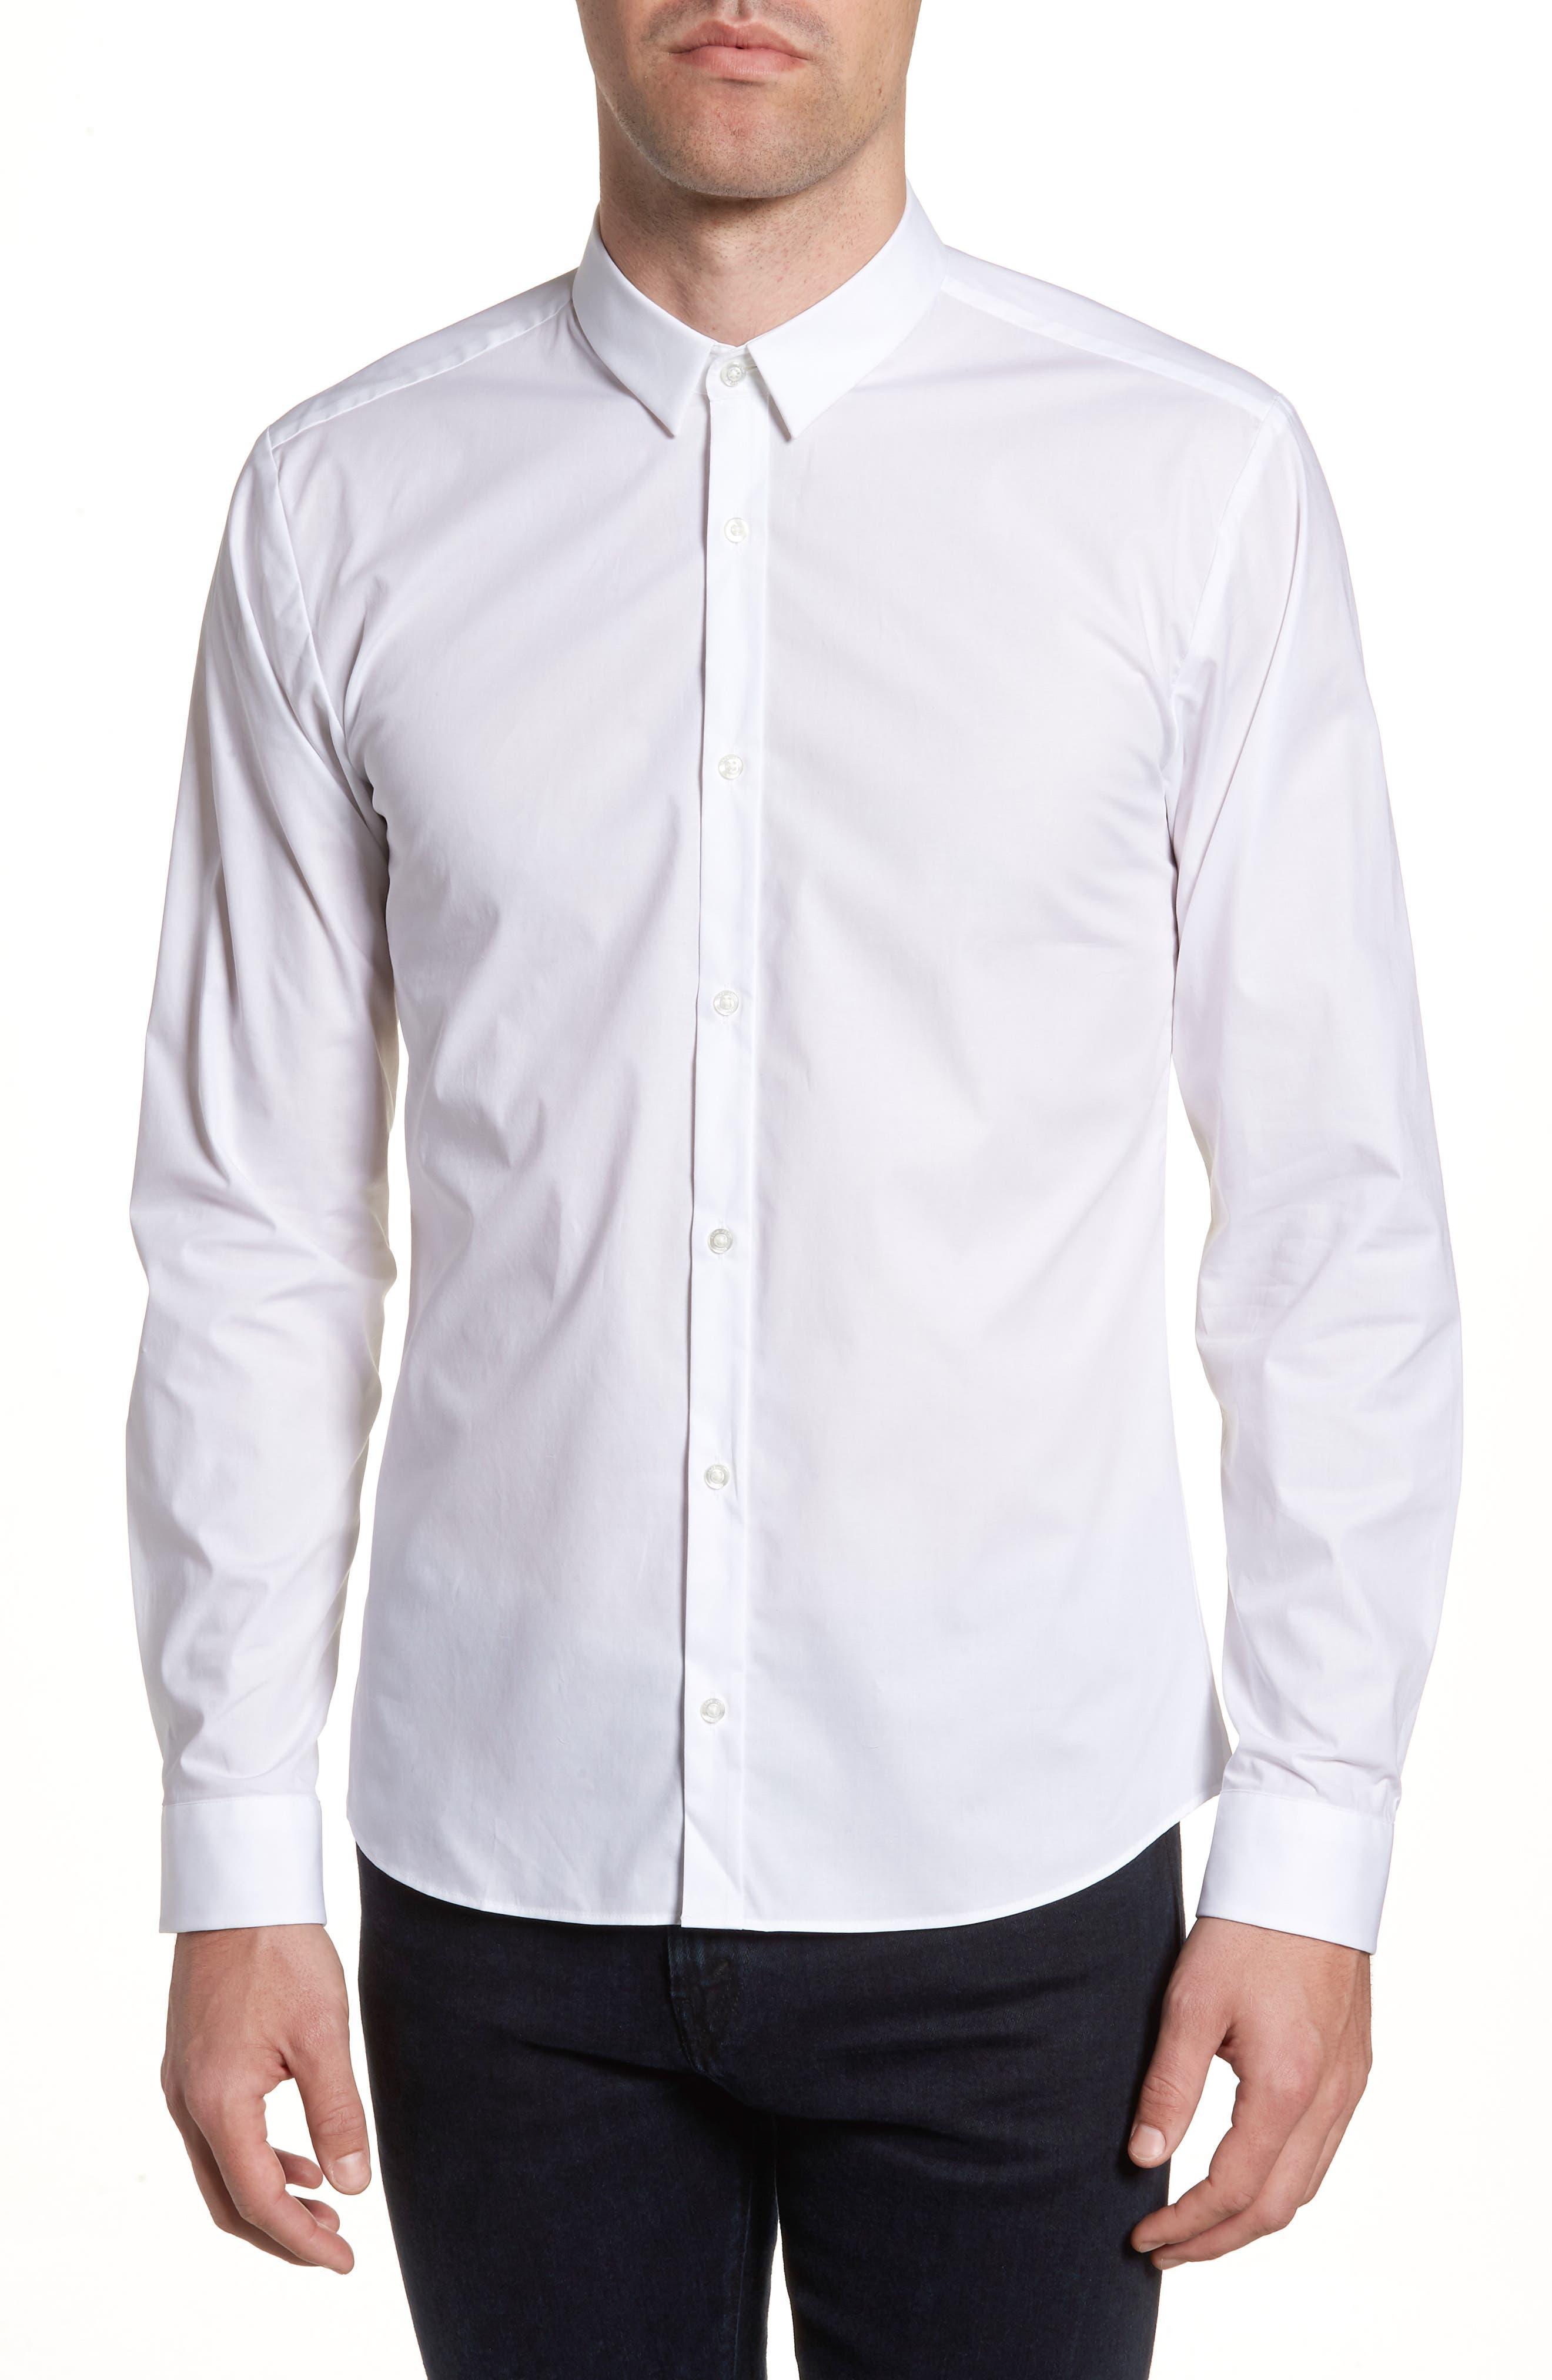 Ero3 Trim Fit Sport Shirt,                         Main,                         color, White